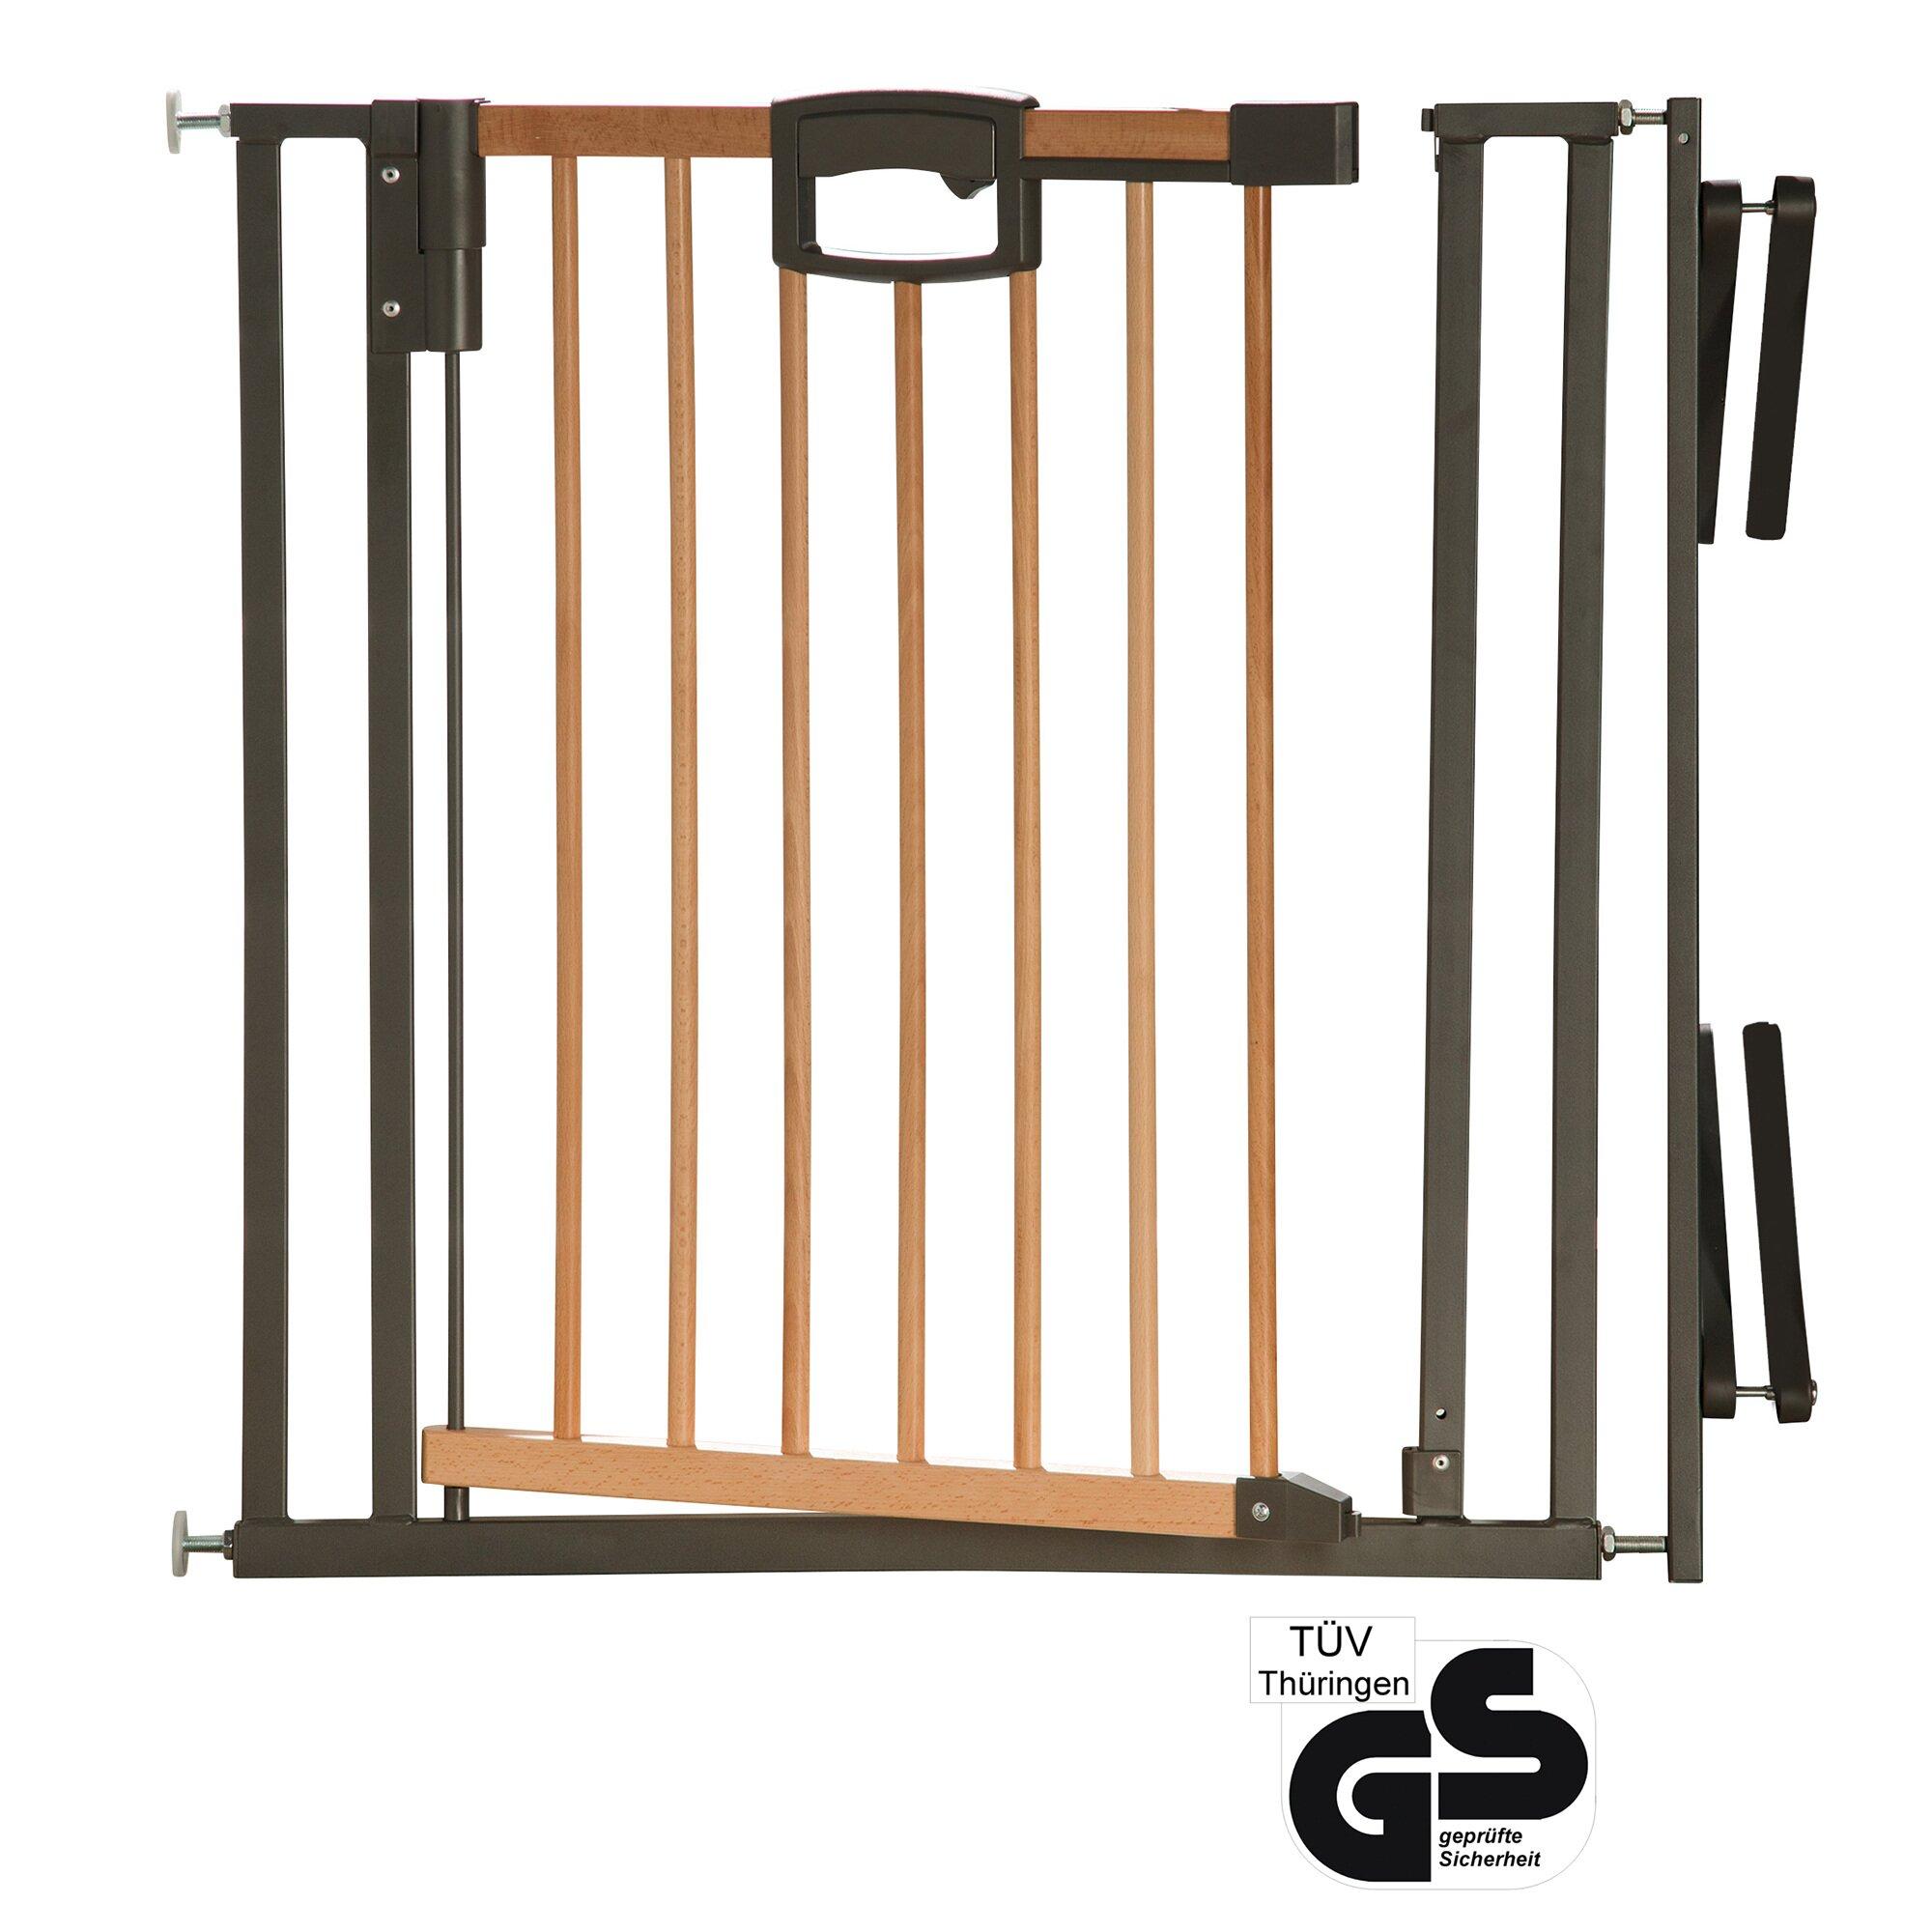 geuther-treppenschutzgitter-easylock-wood-plus-84-5-92-5-cm